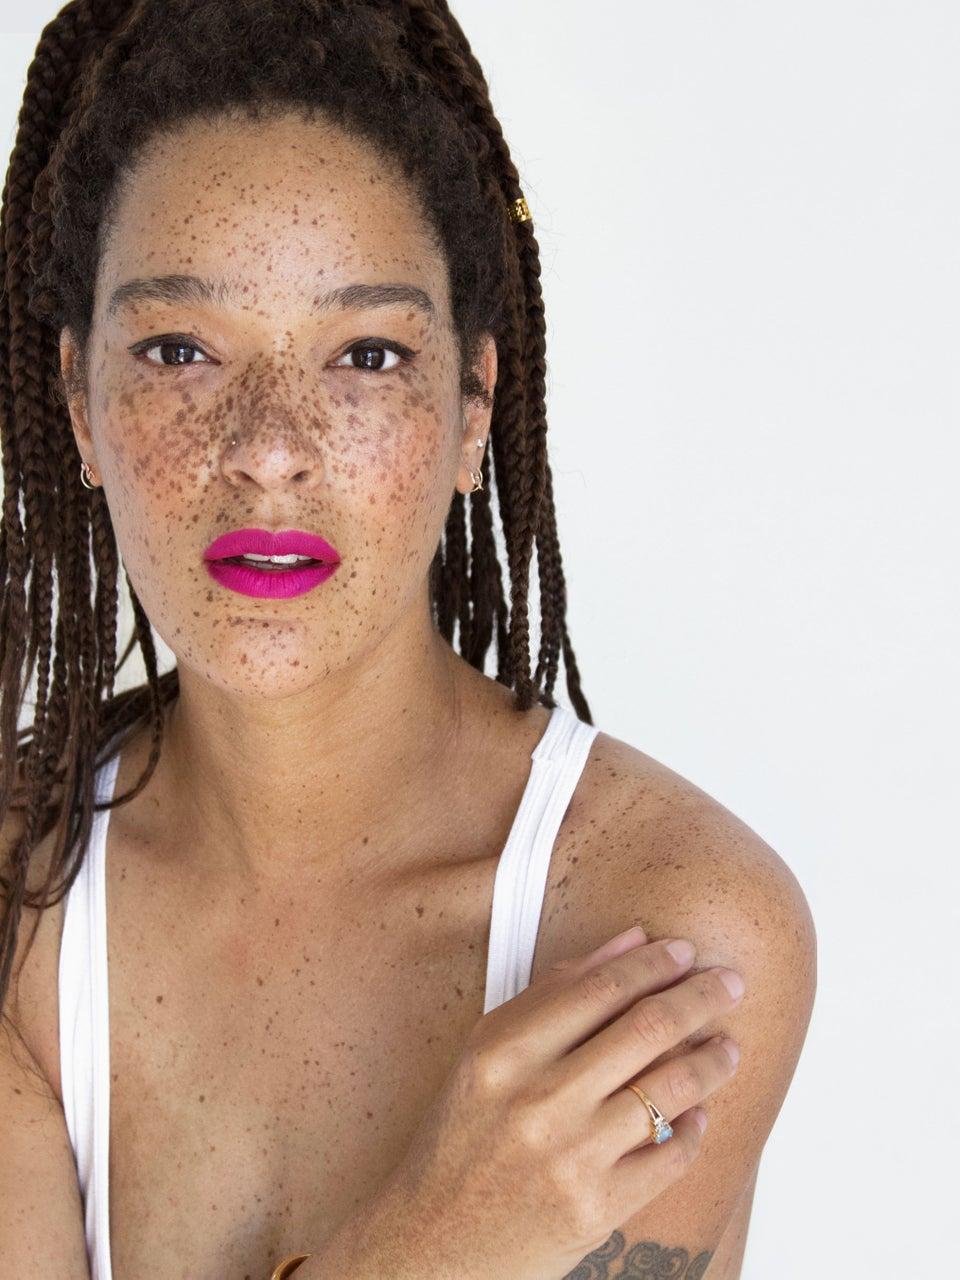 'Black Girl Beautiful' Creator Nikia Phoenix On Why She'll Never Hide Her Freckles